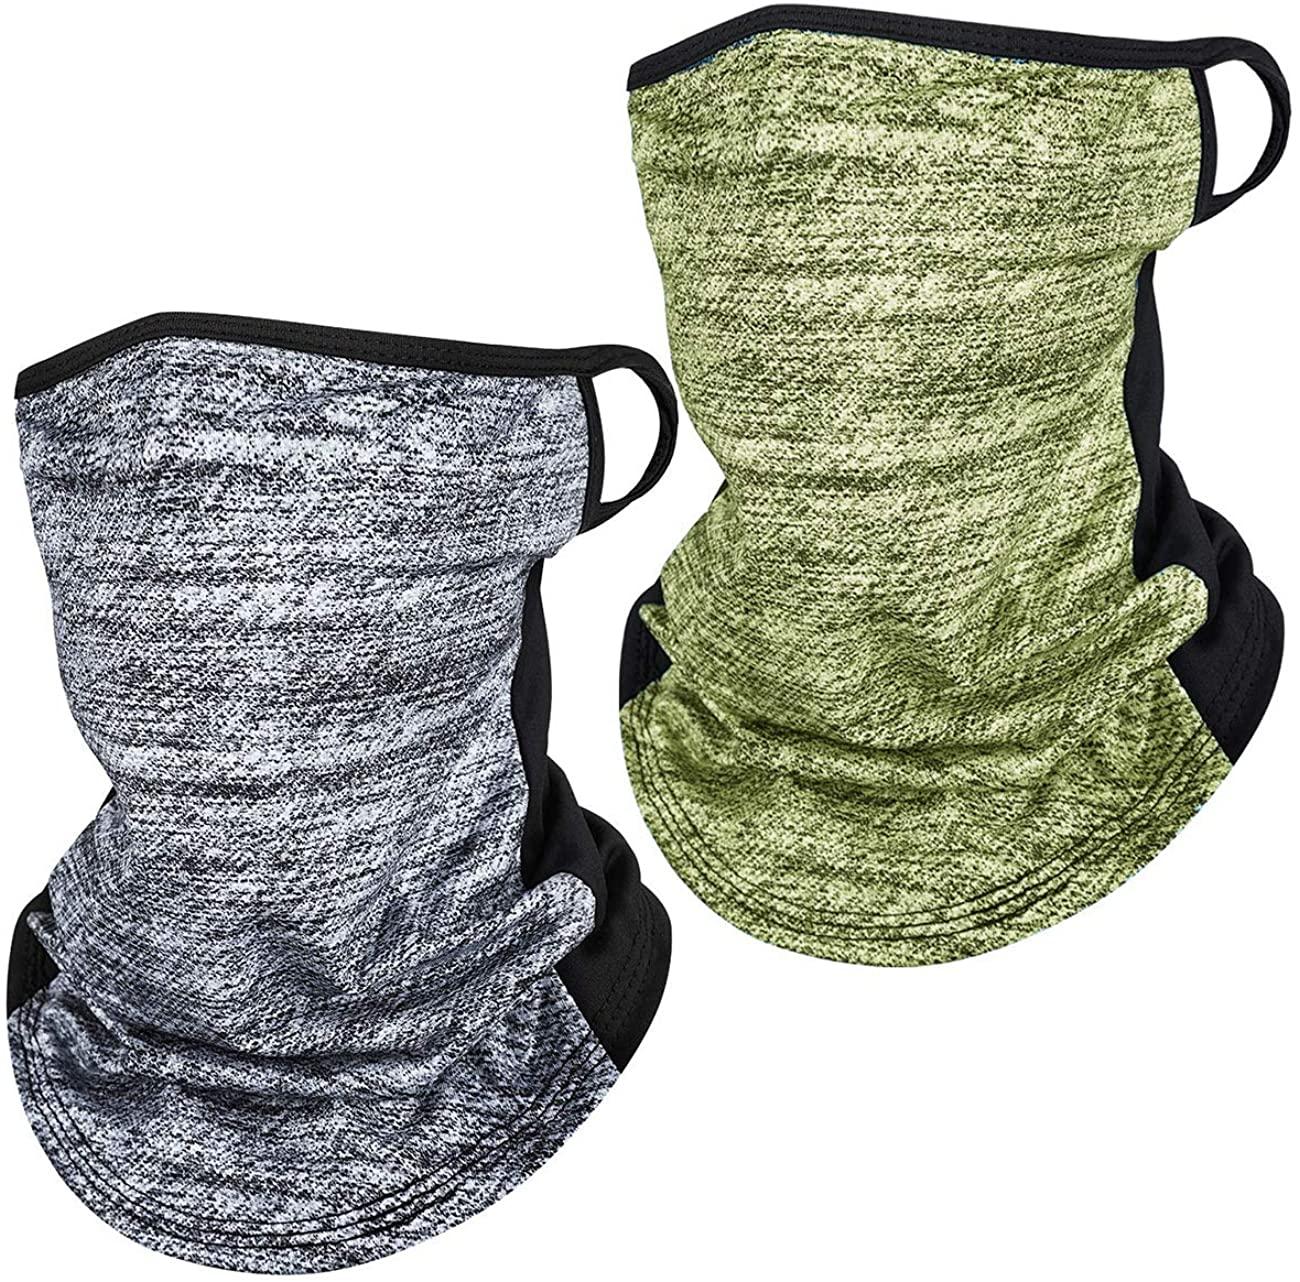 VEOBIKE 2Pcs Men Women Face Bandana Scarf Ear Loops Balaclava Headwear Neck Gaiter for Dust Wind UV Cycling Hiking